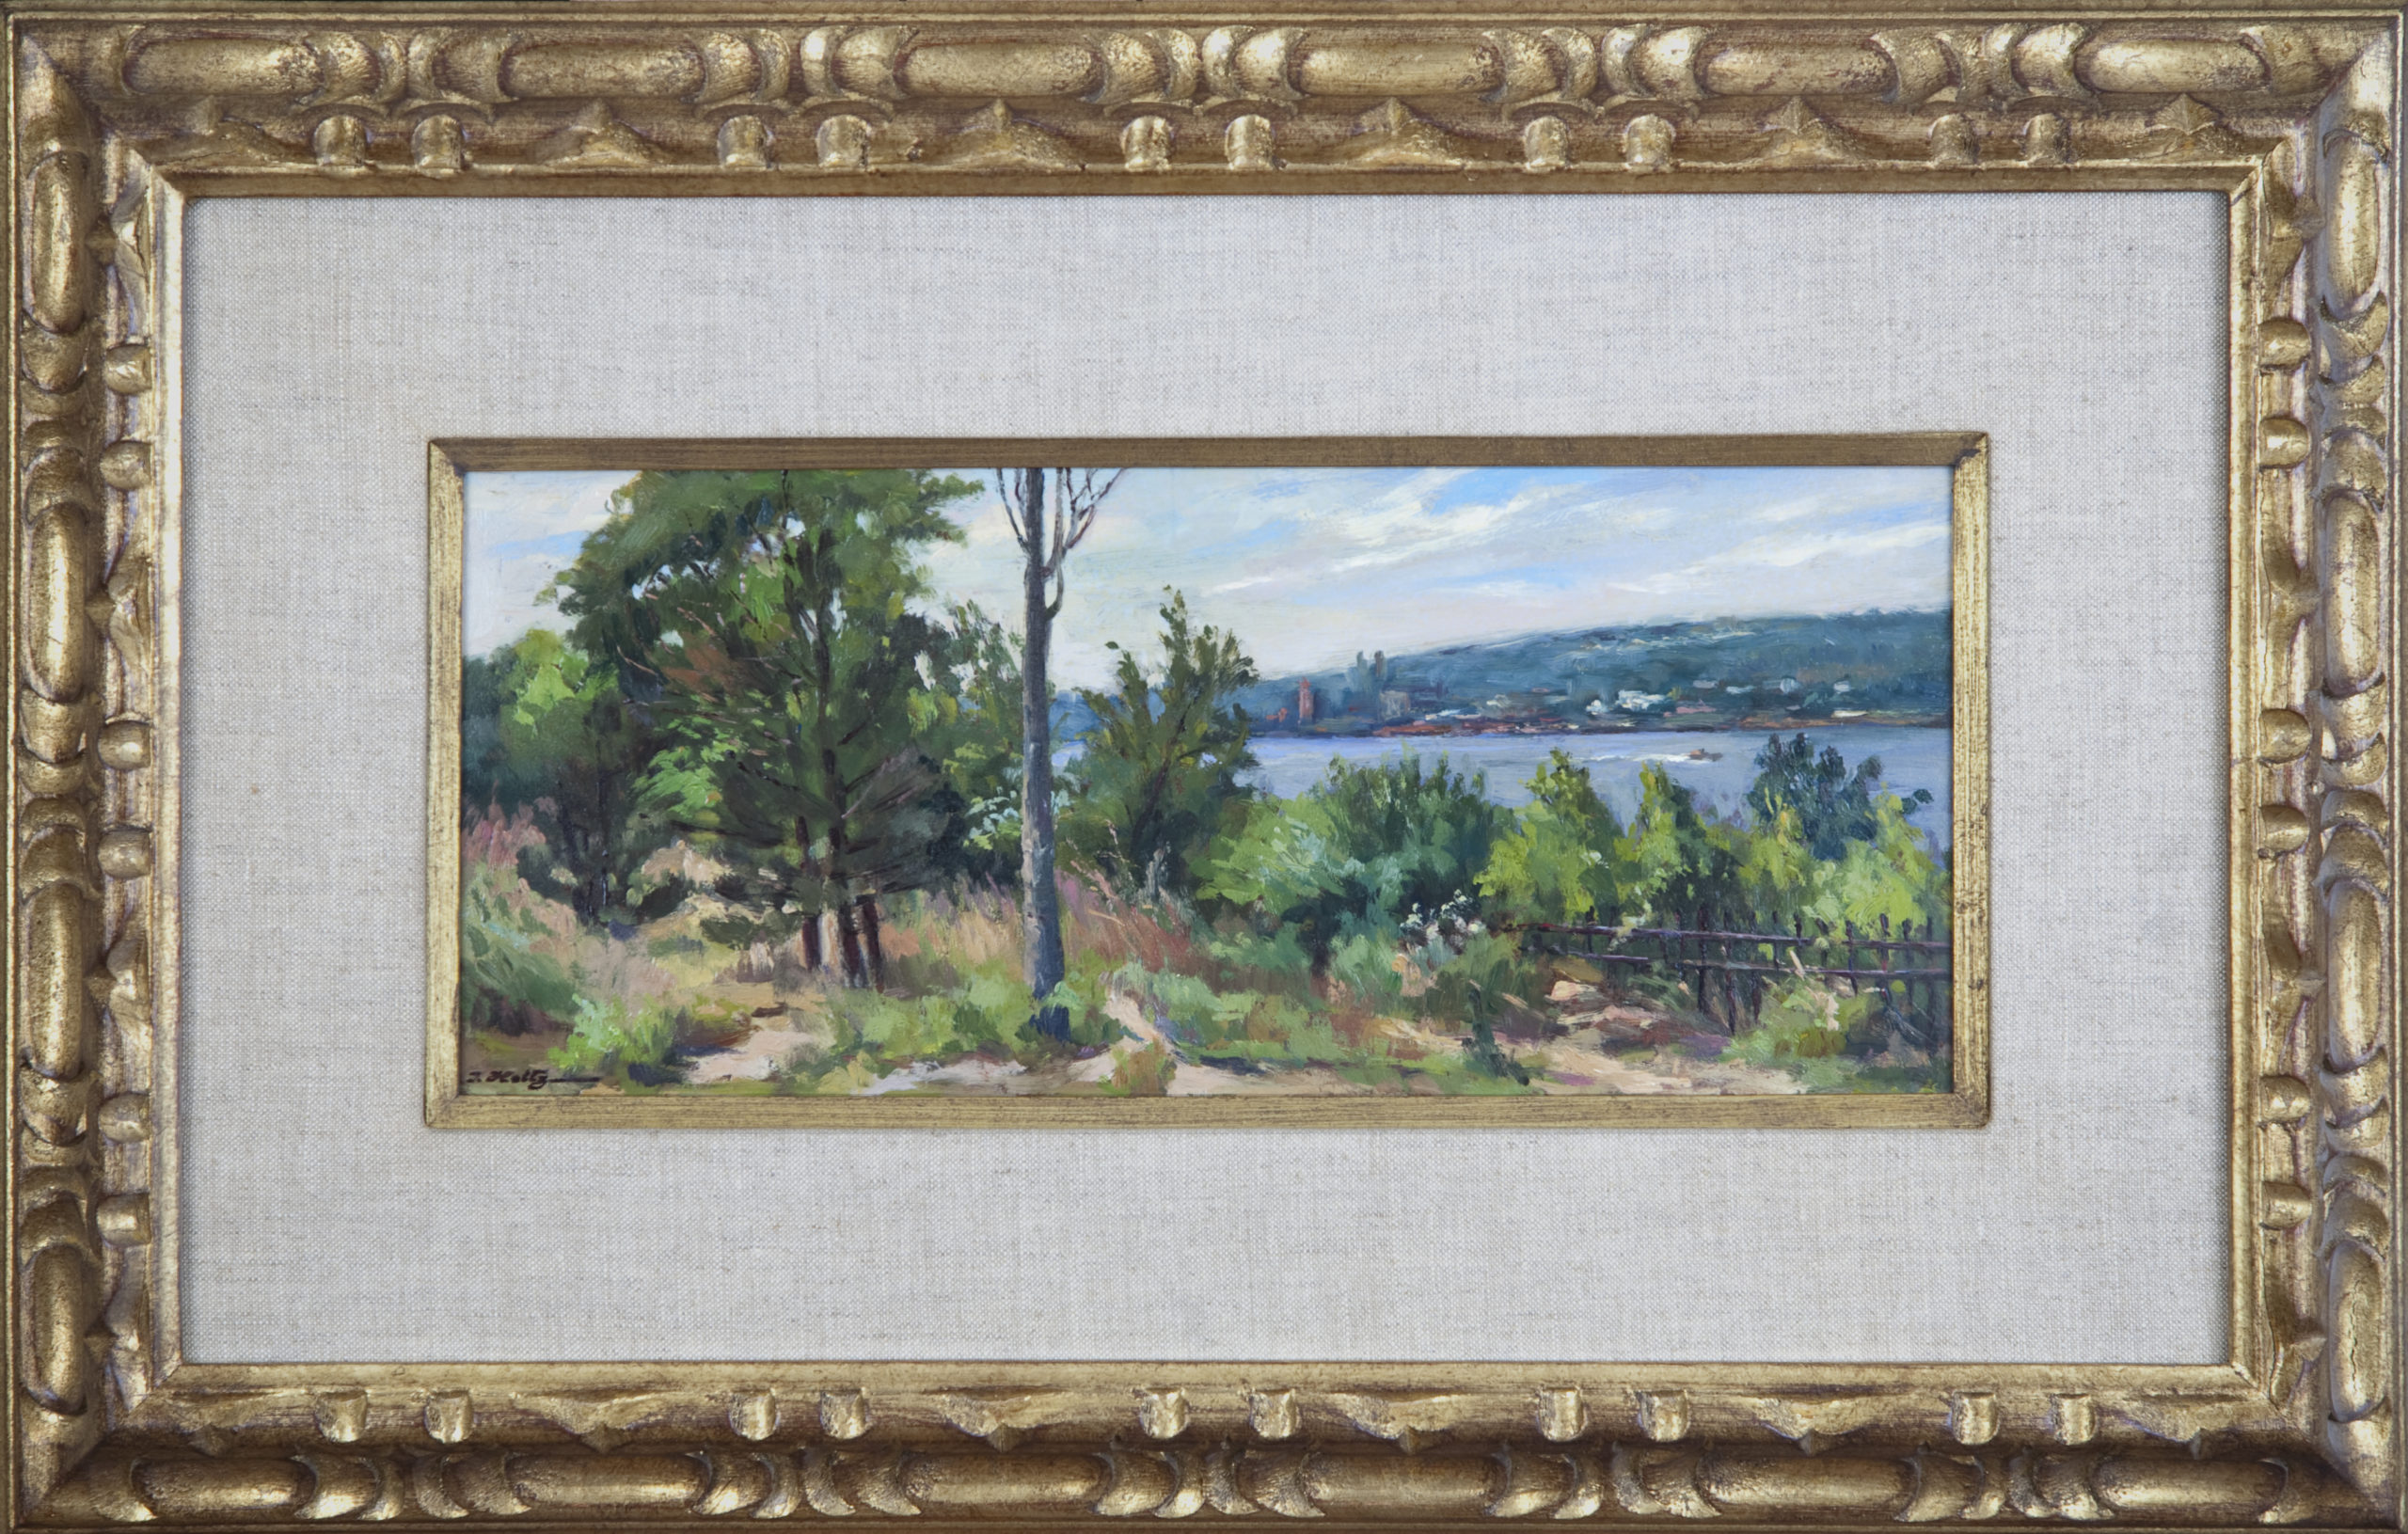 149 Along Side the River 1966 - Oil on Masonite - 14.5 x 6 - Frame: 23.25 x 15 x 1.5